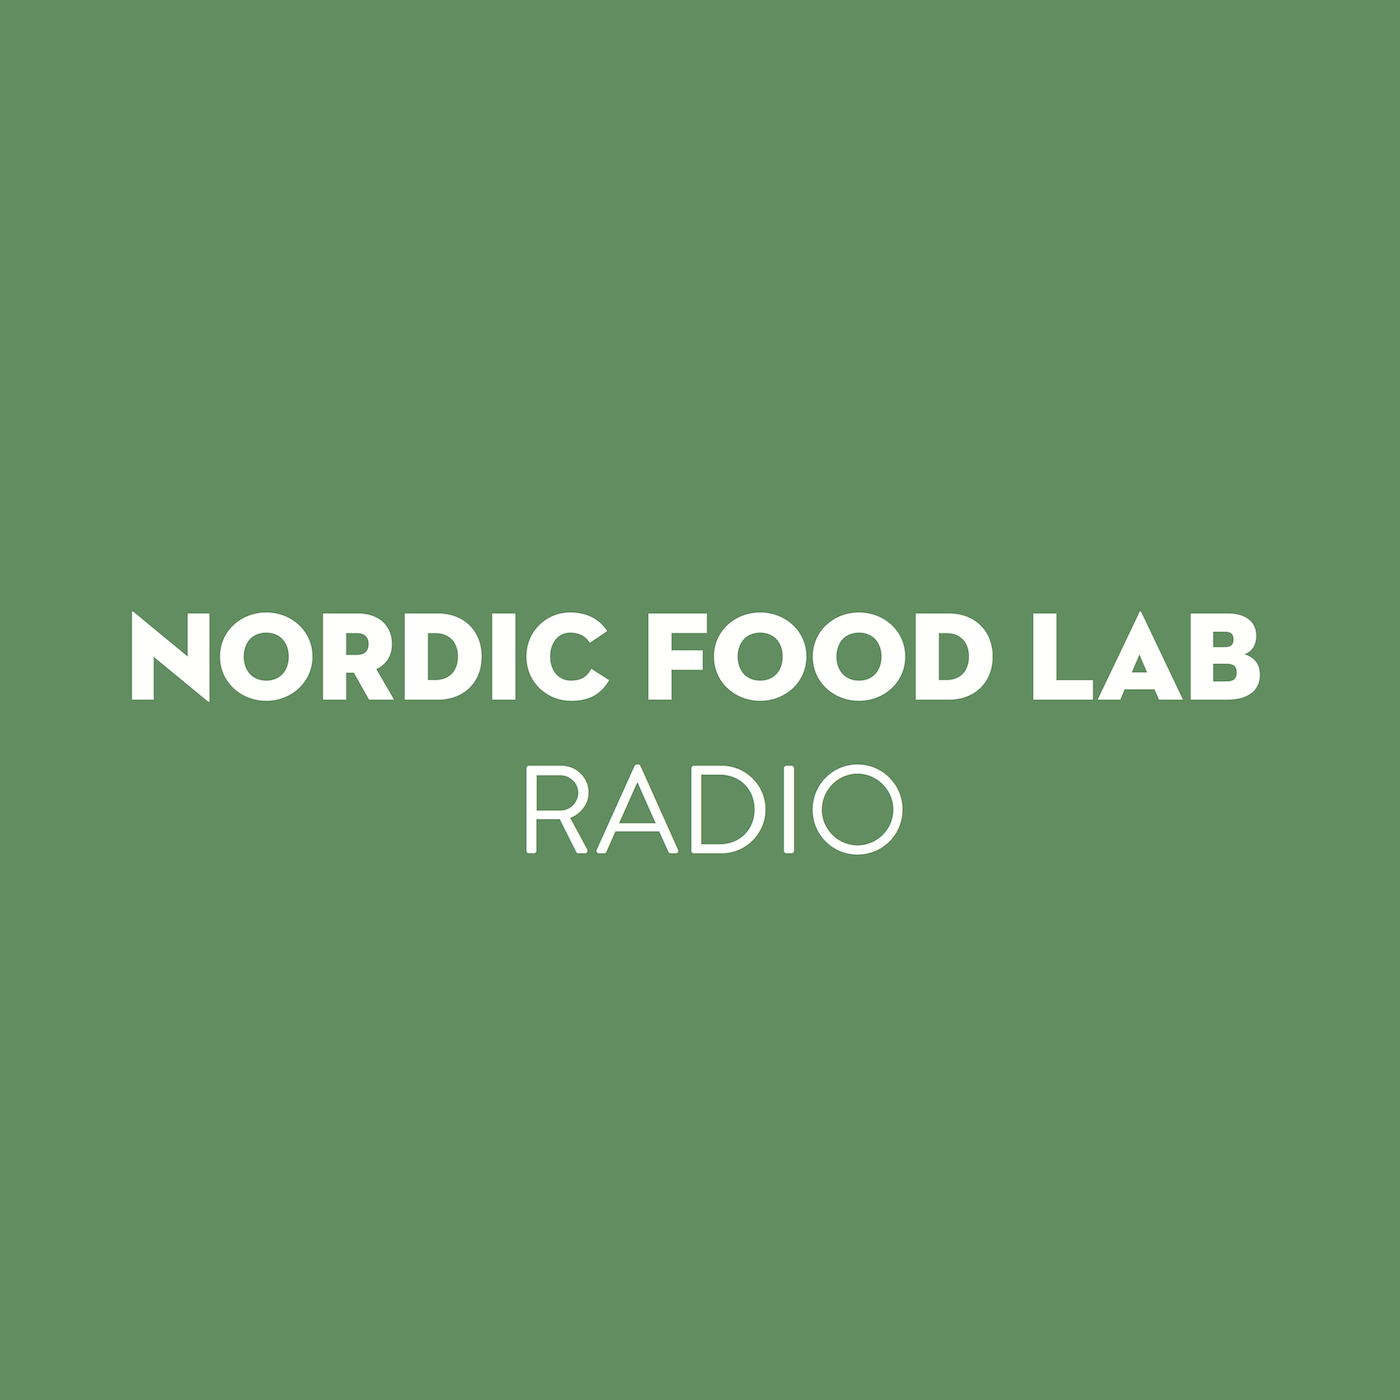 Nflr_logo